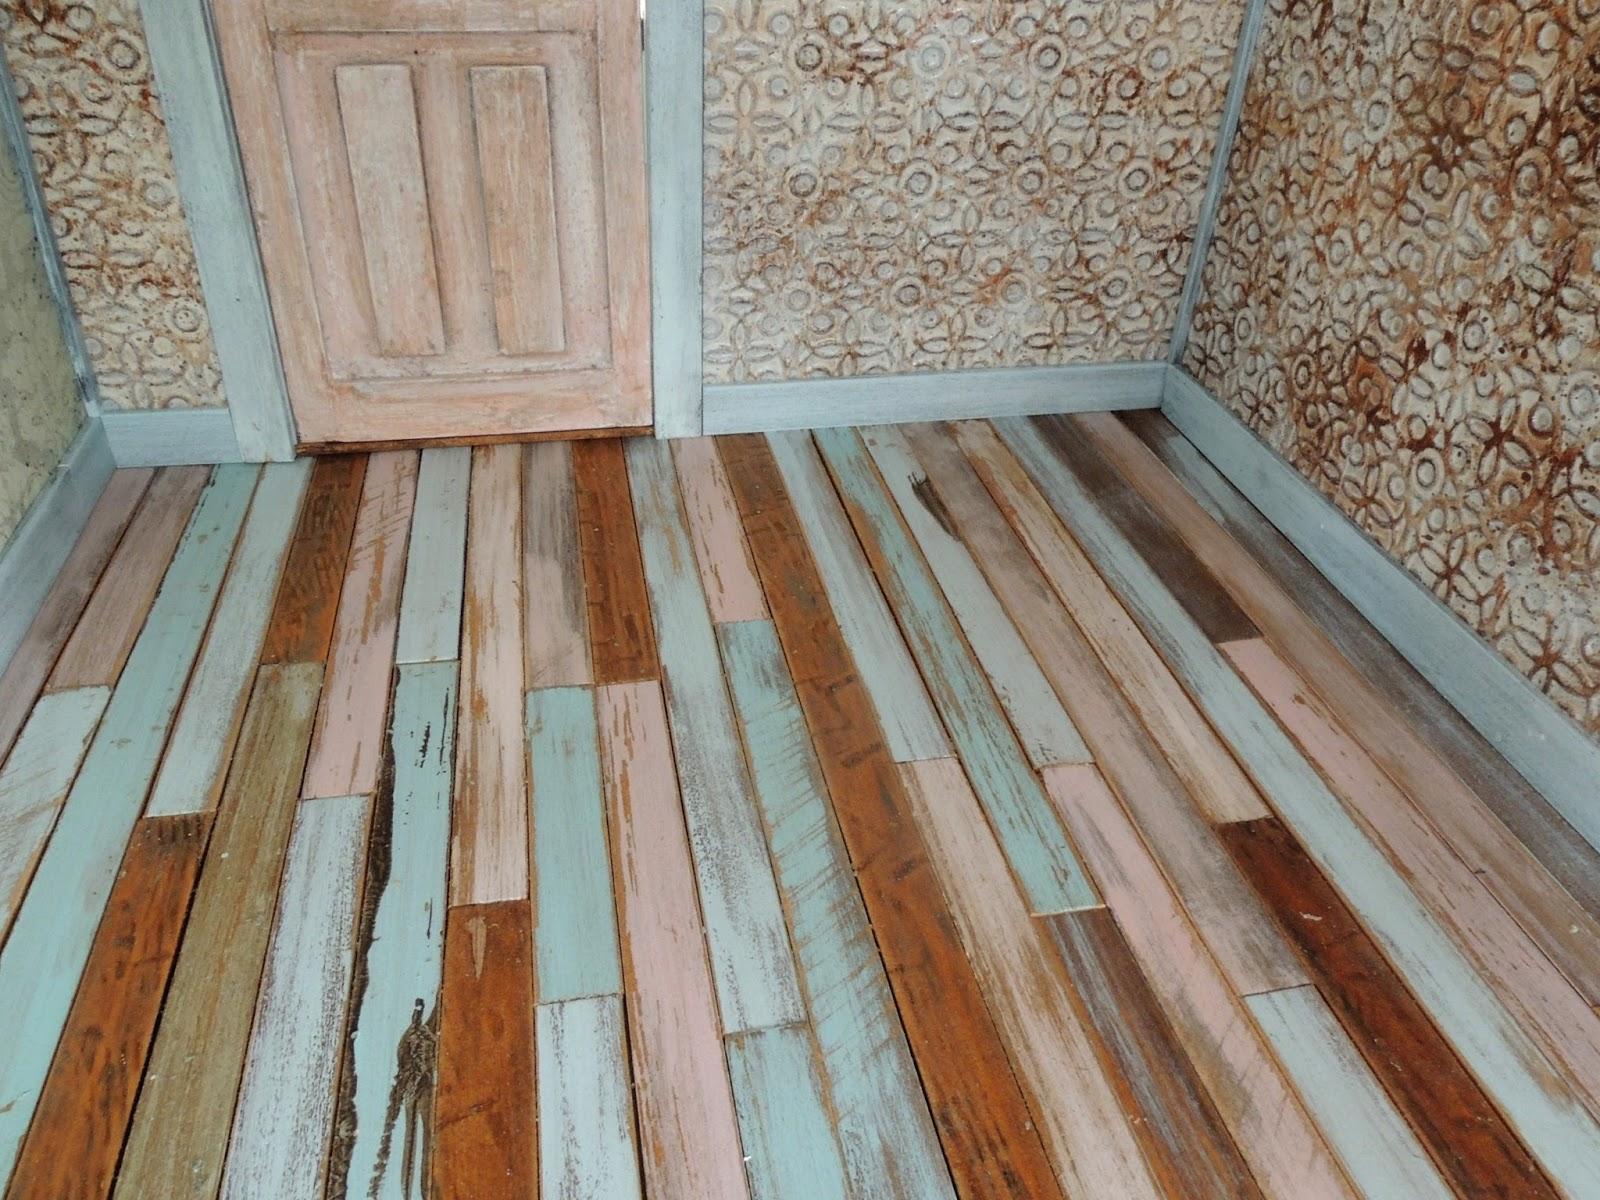 Bathroom floor boards - The Farmhouse Bathroom Renovation